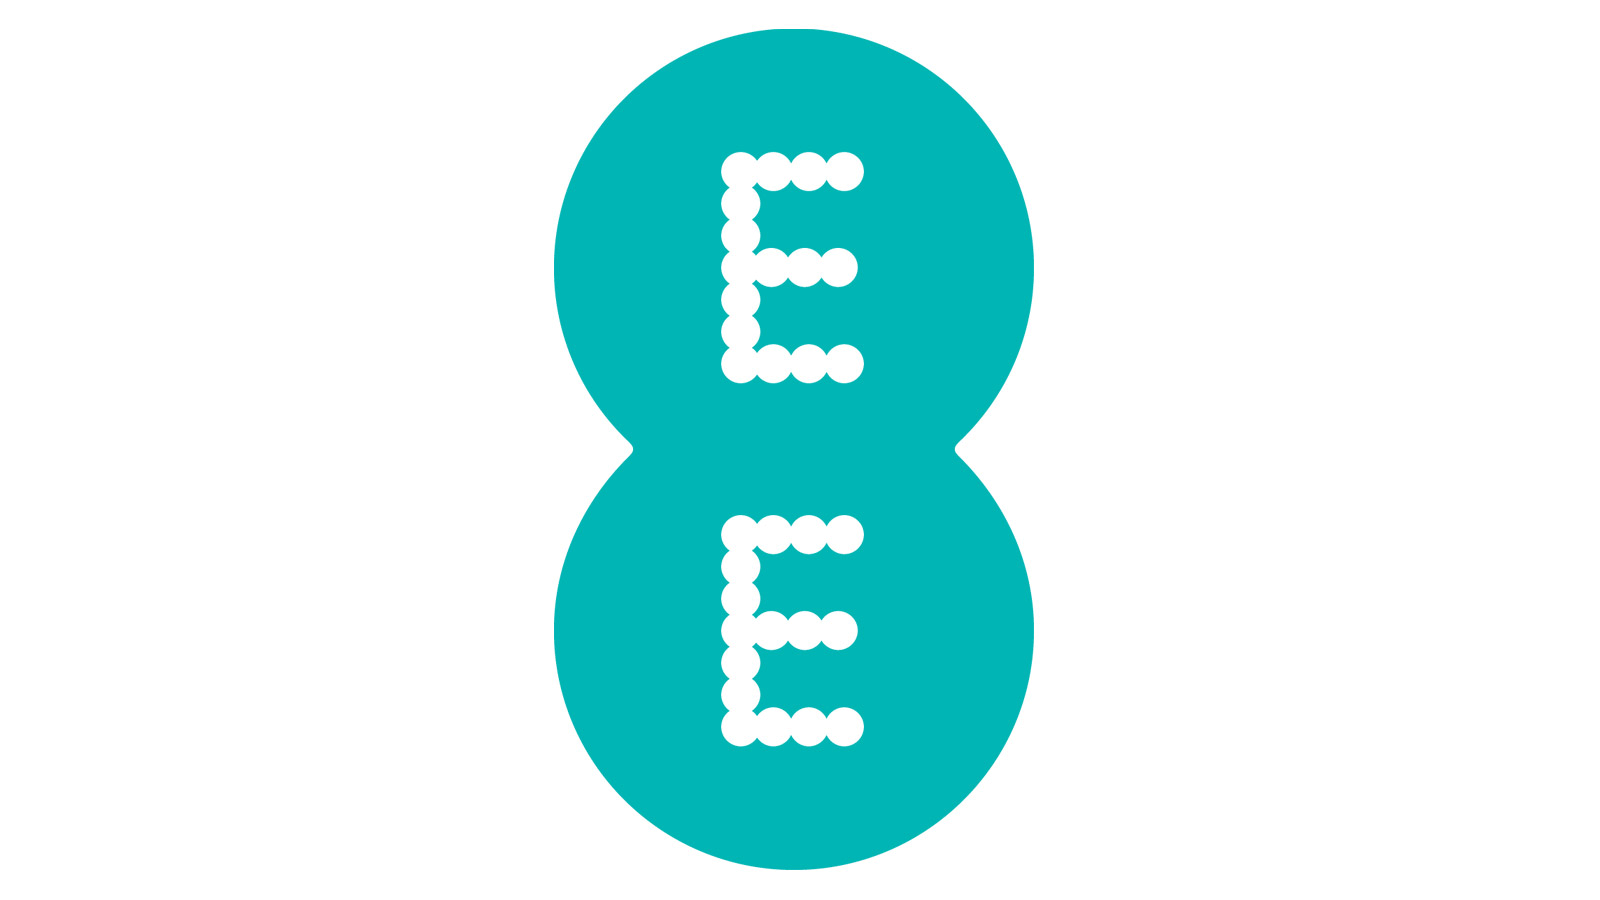 ee-logo-1600x900.png